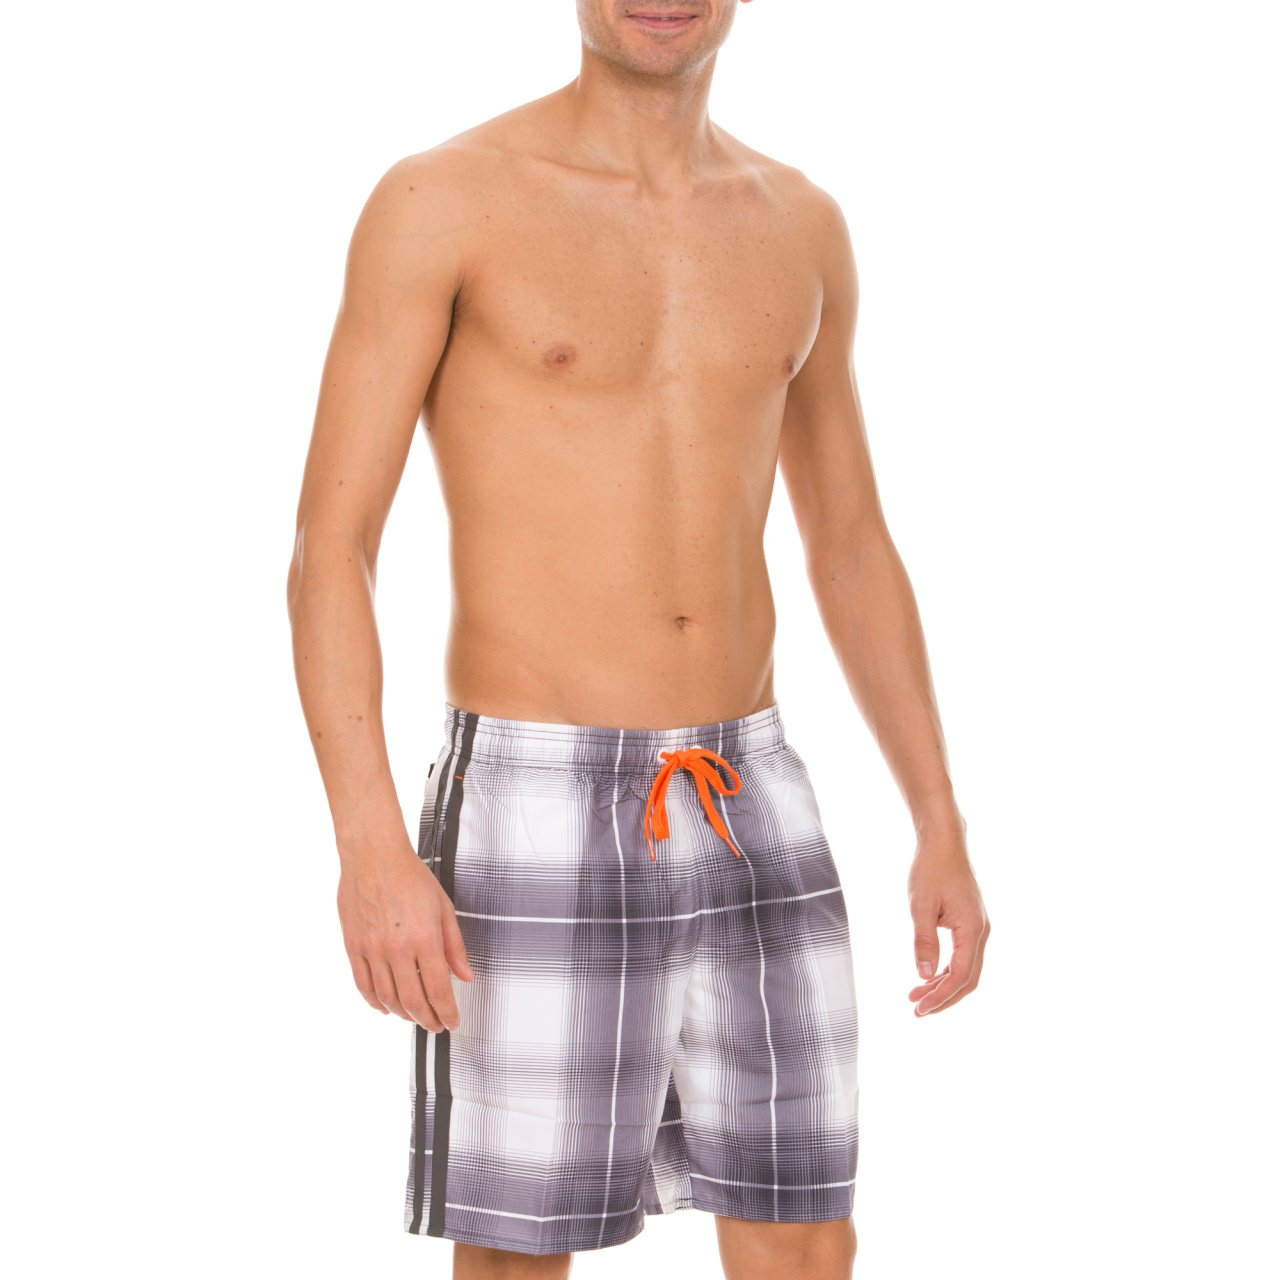 8e1a5b94429 Arena Men's Swimming Trunks Printed Check Shorts White White, Mango,  Asphalt Size:Small: Amazon.co.uk: Sports & Outdoors